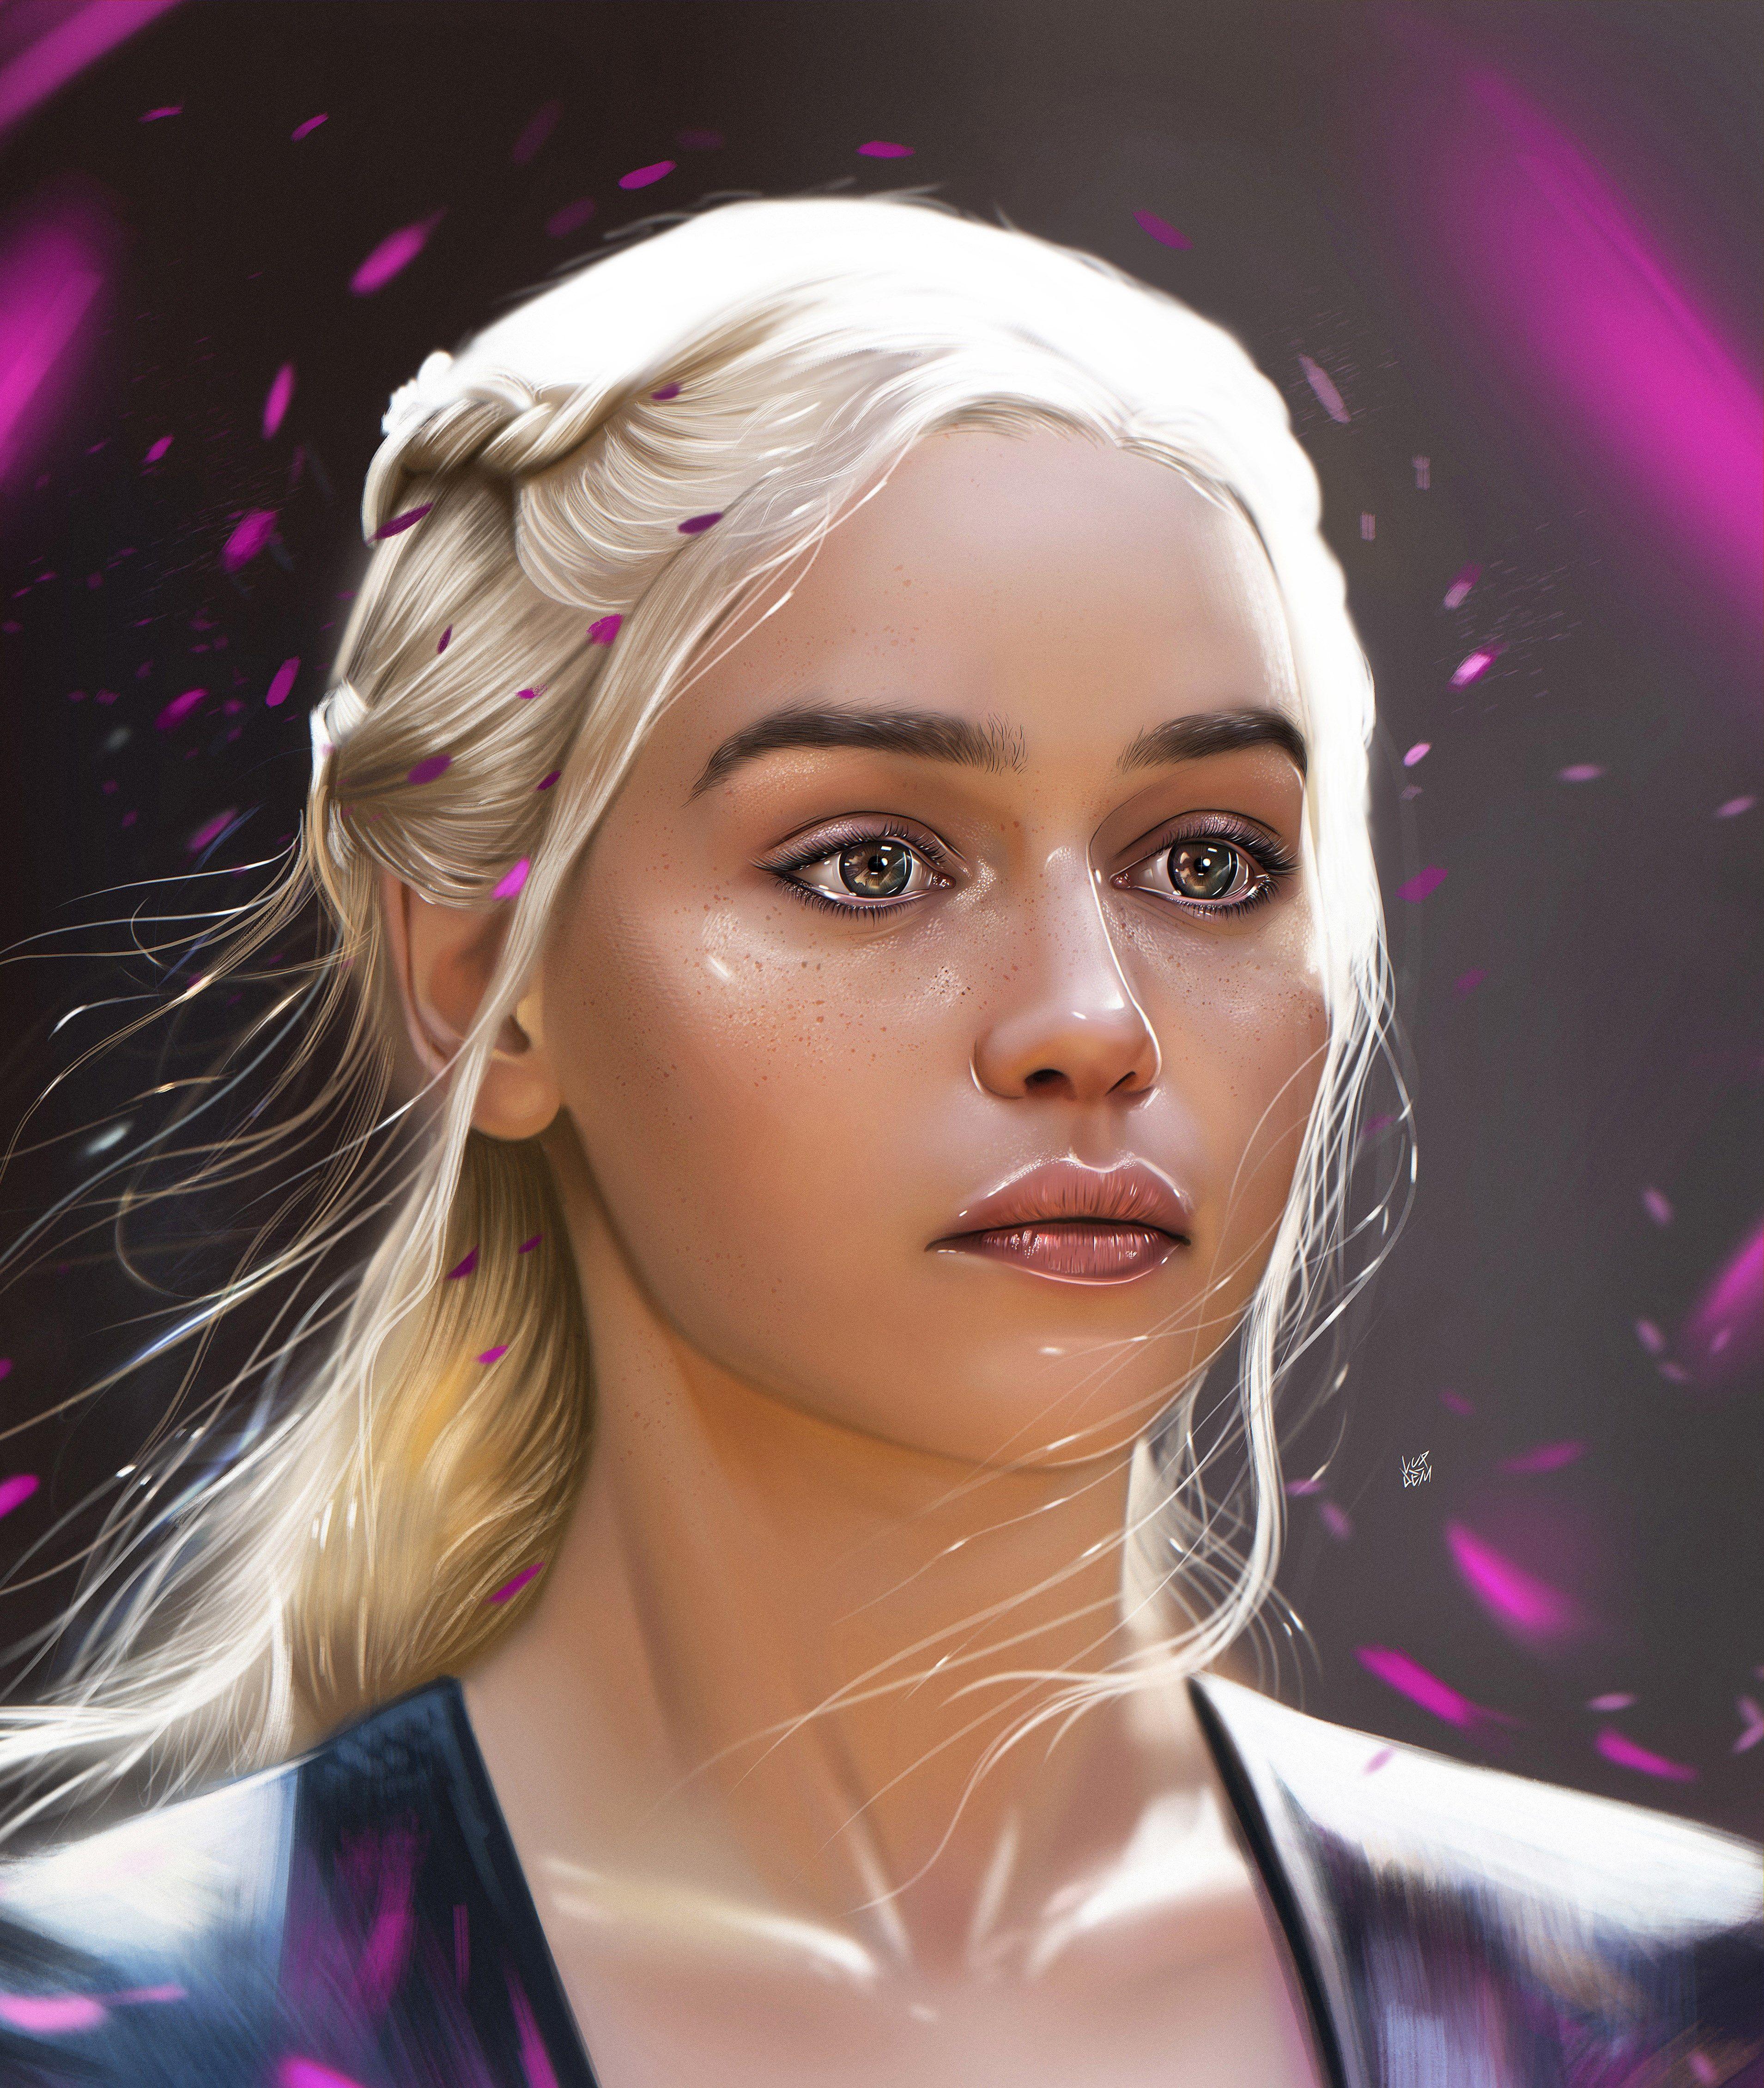 3819x4521 Daenerys Targaryen 4k Desktop Wallpaper Hd Daenerys Targaryen Emilia Clarke Daenerys Targaryen Daenerys Targaryen Wallpaper